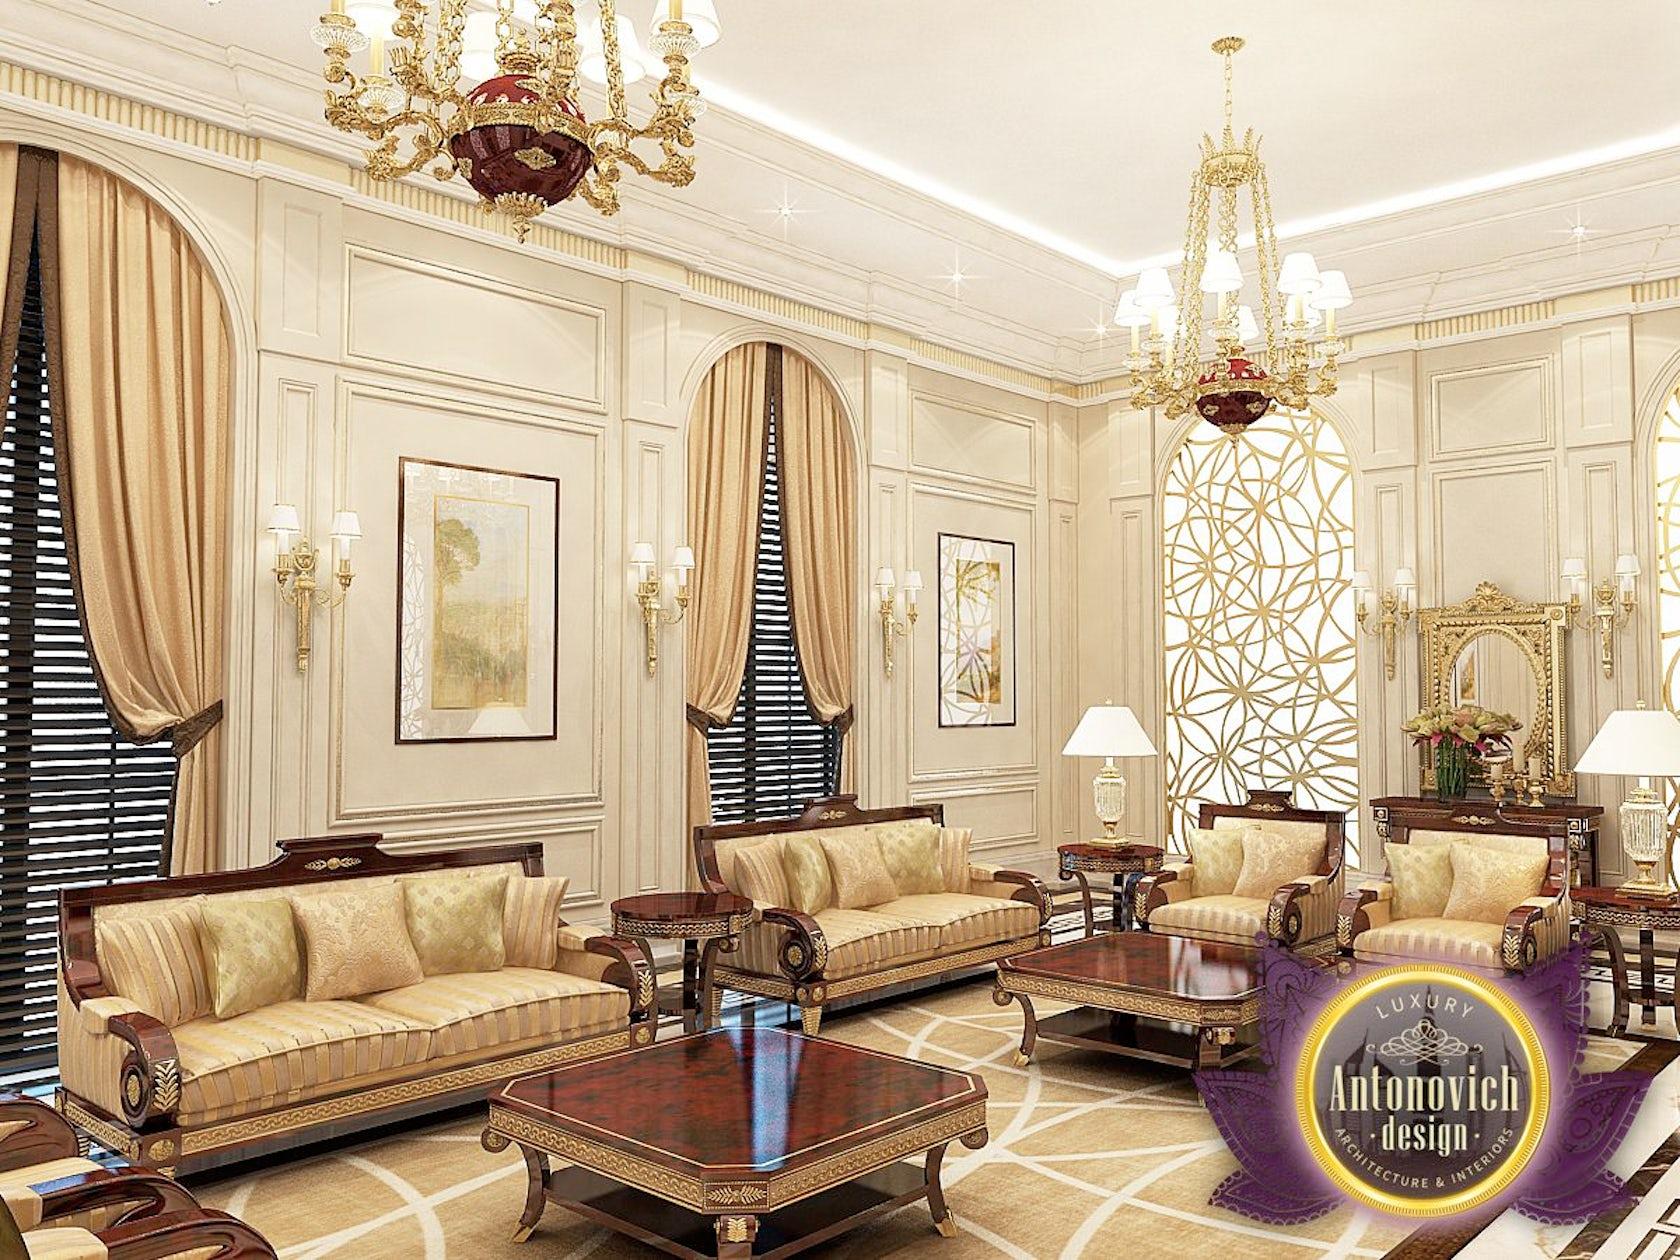 Kitchen Design Usa By Katrina Antonovich: Living Room Design By Katrina Antonovich